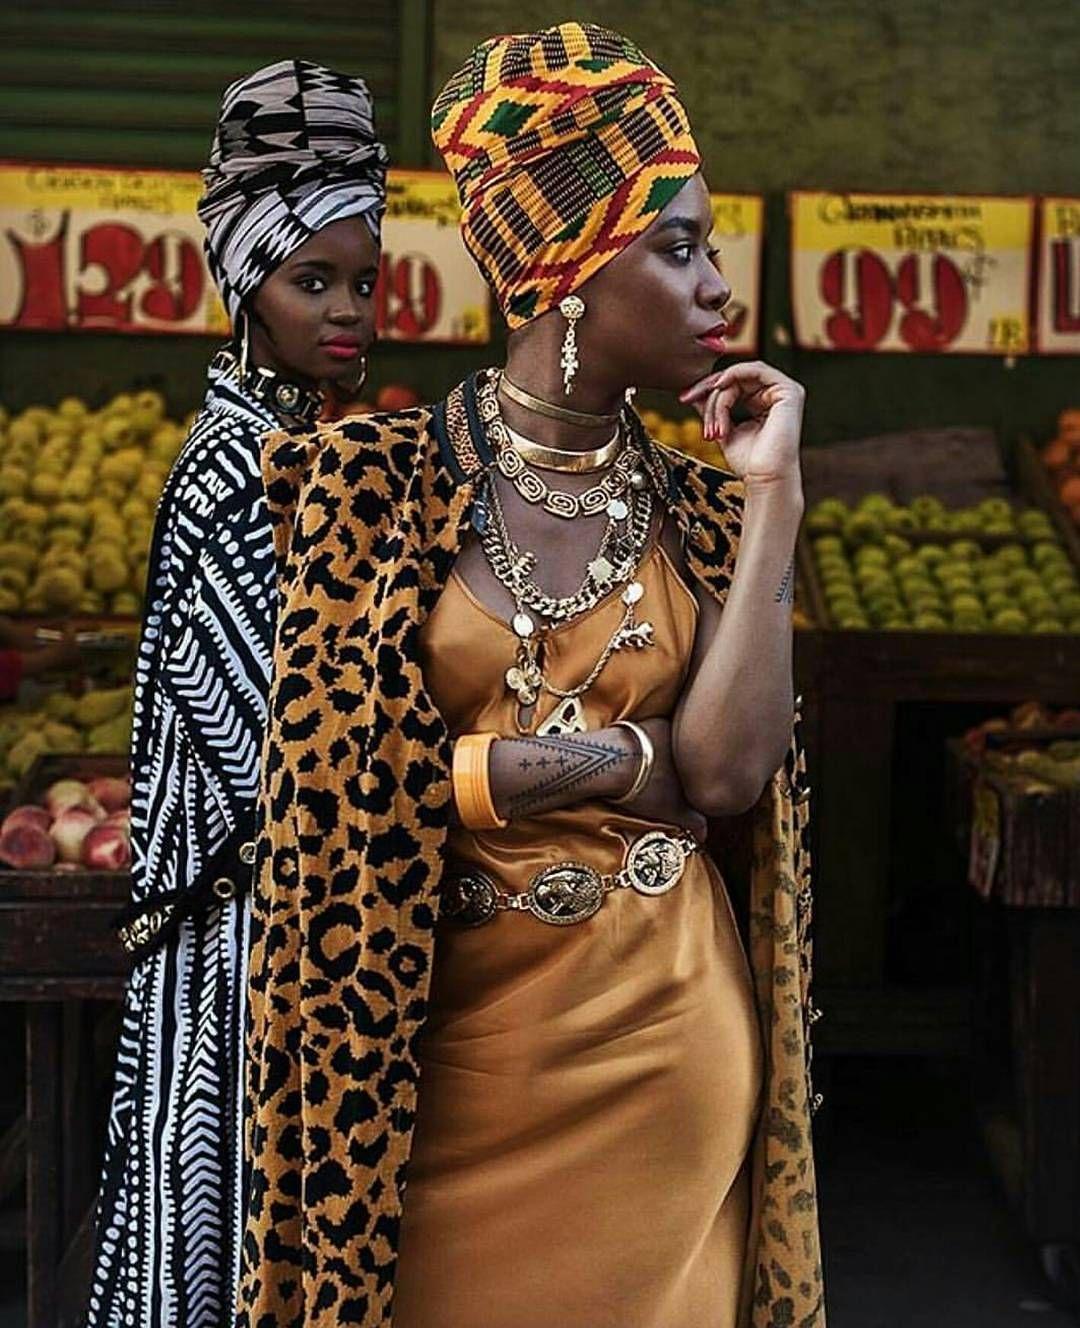 Color zen magazine - 584 Likes 5 Comments Zen Magazine Africa Zenmagafrica On Instagram